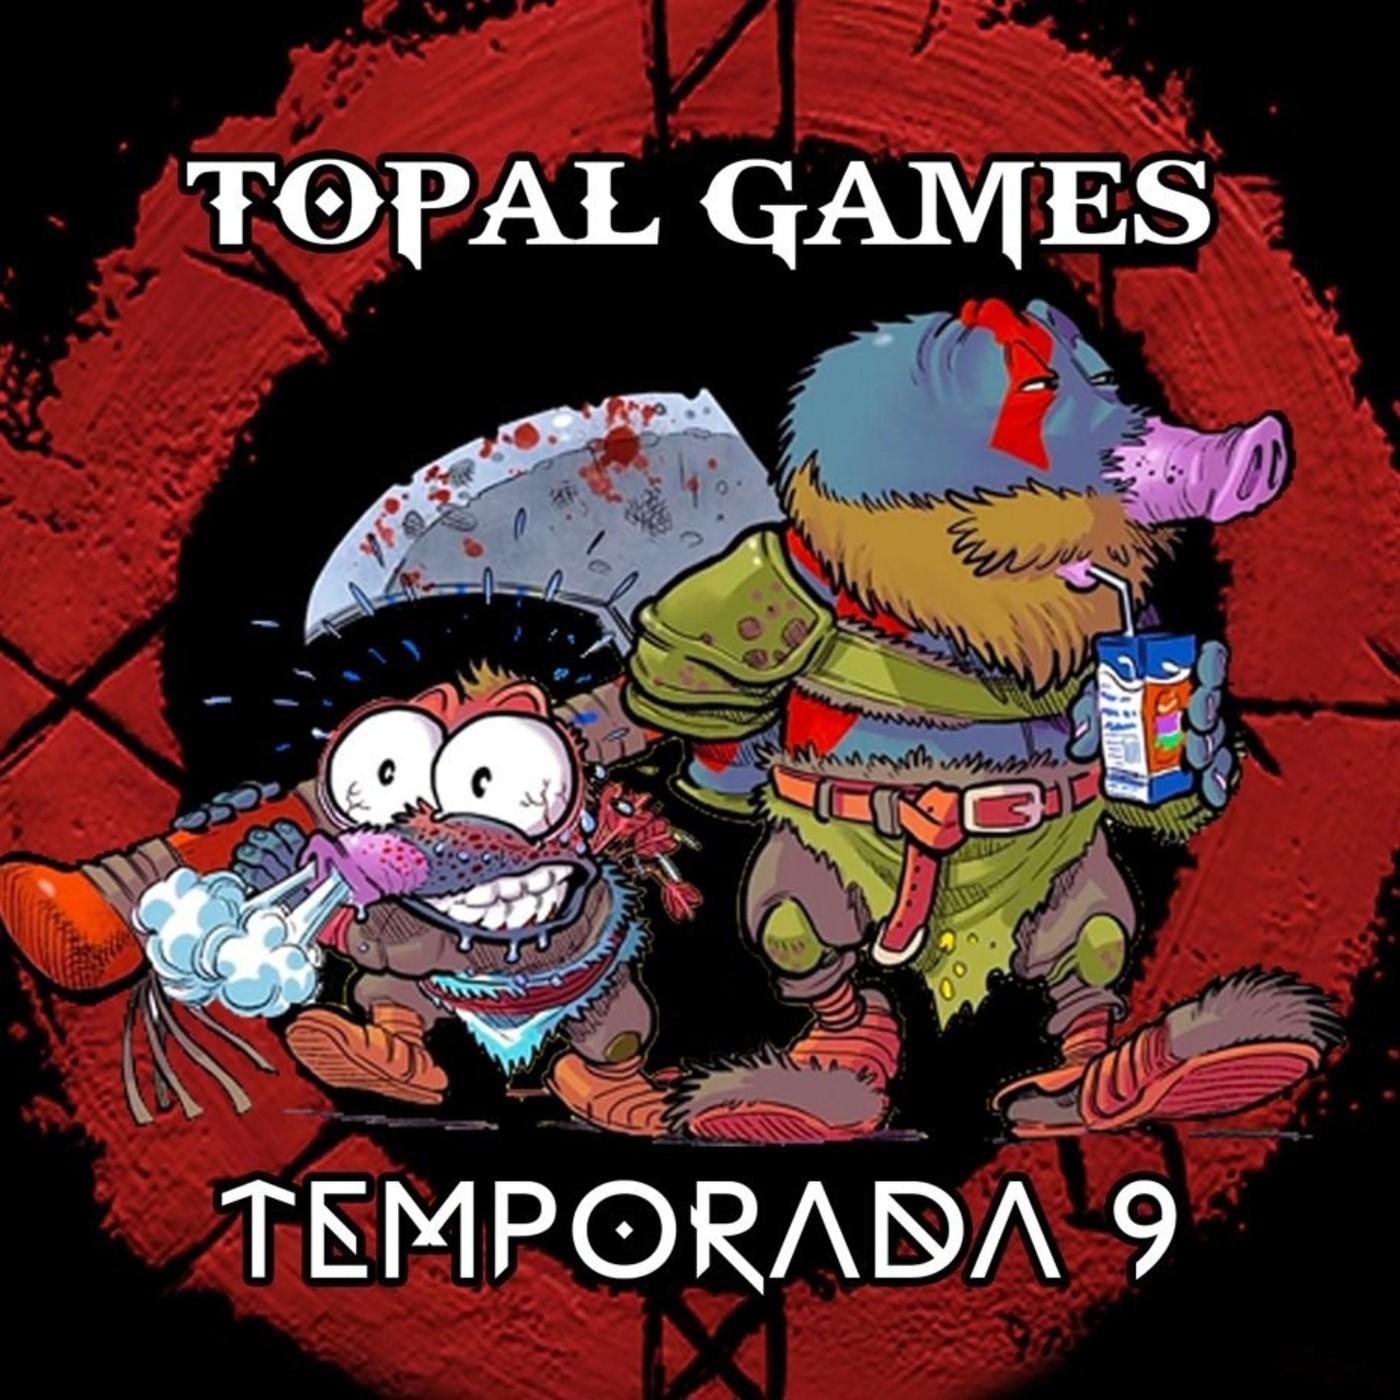 Topal Games (9x10) Persona 5 Royal, Sniper Elite 4, Octopath Traveler, Assassins Creed Valhalla